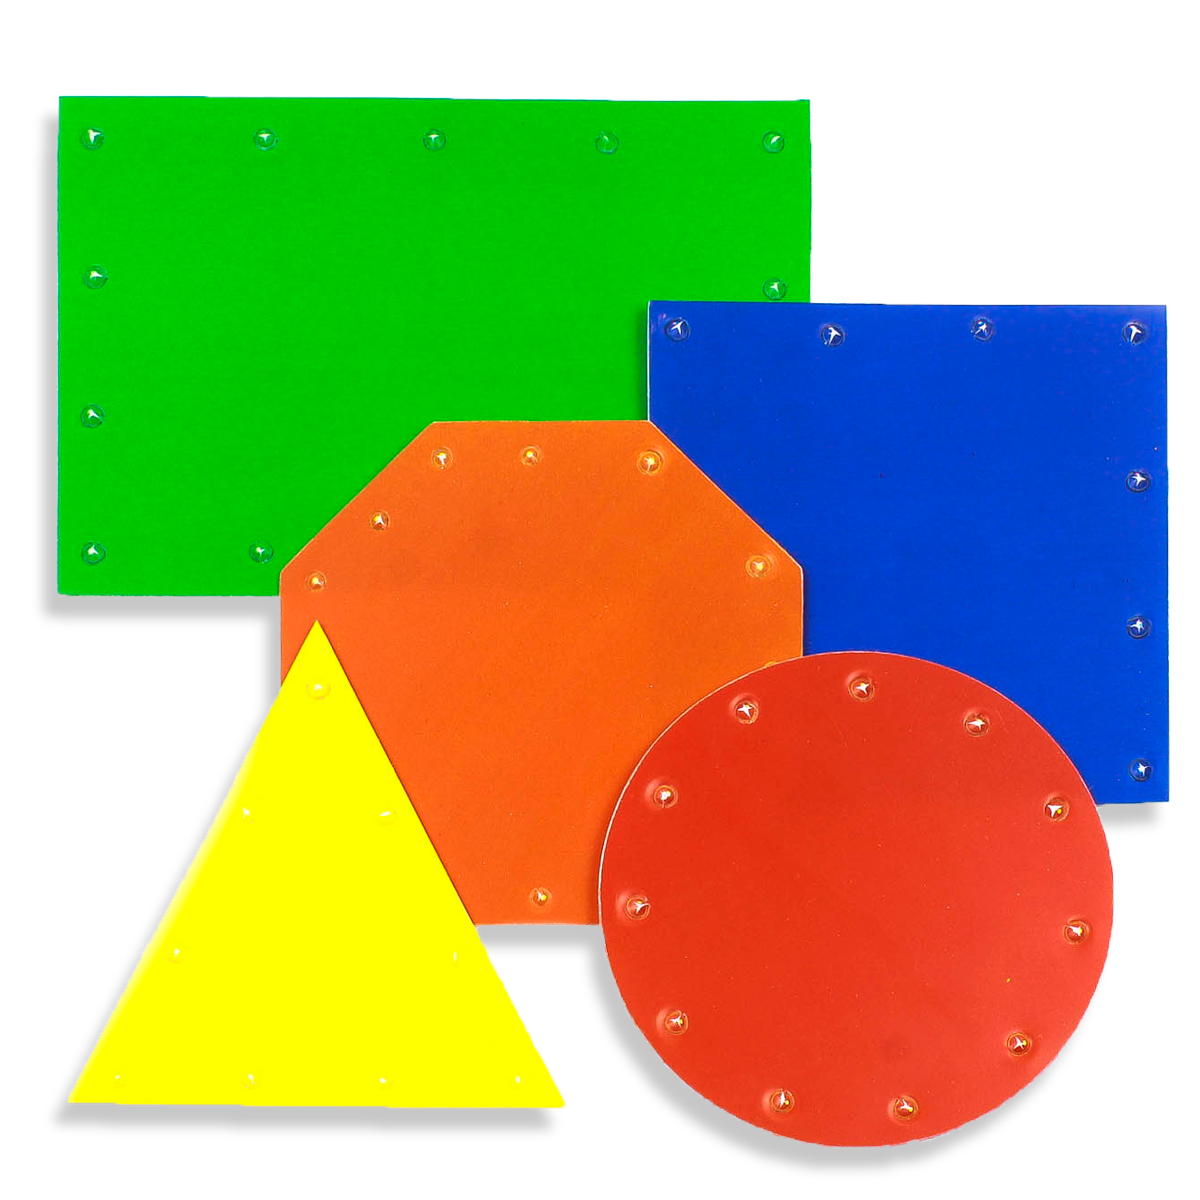 figuras-geométricas-2